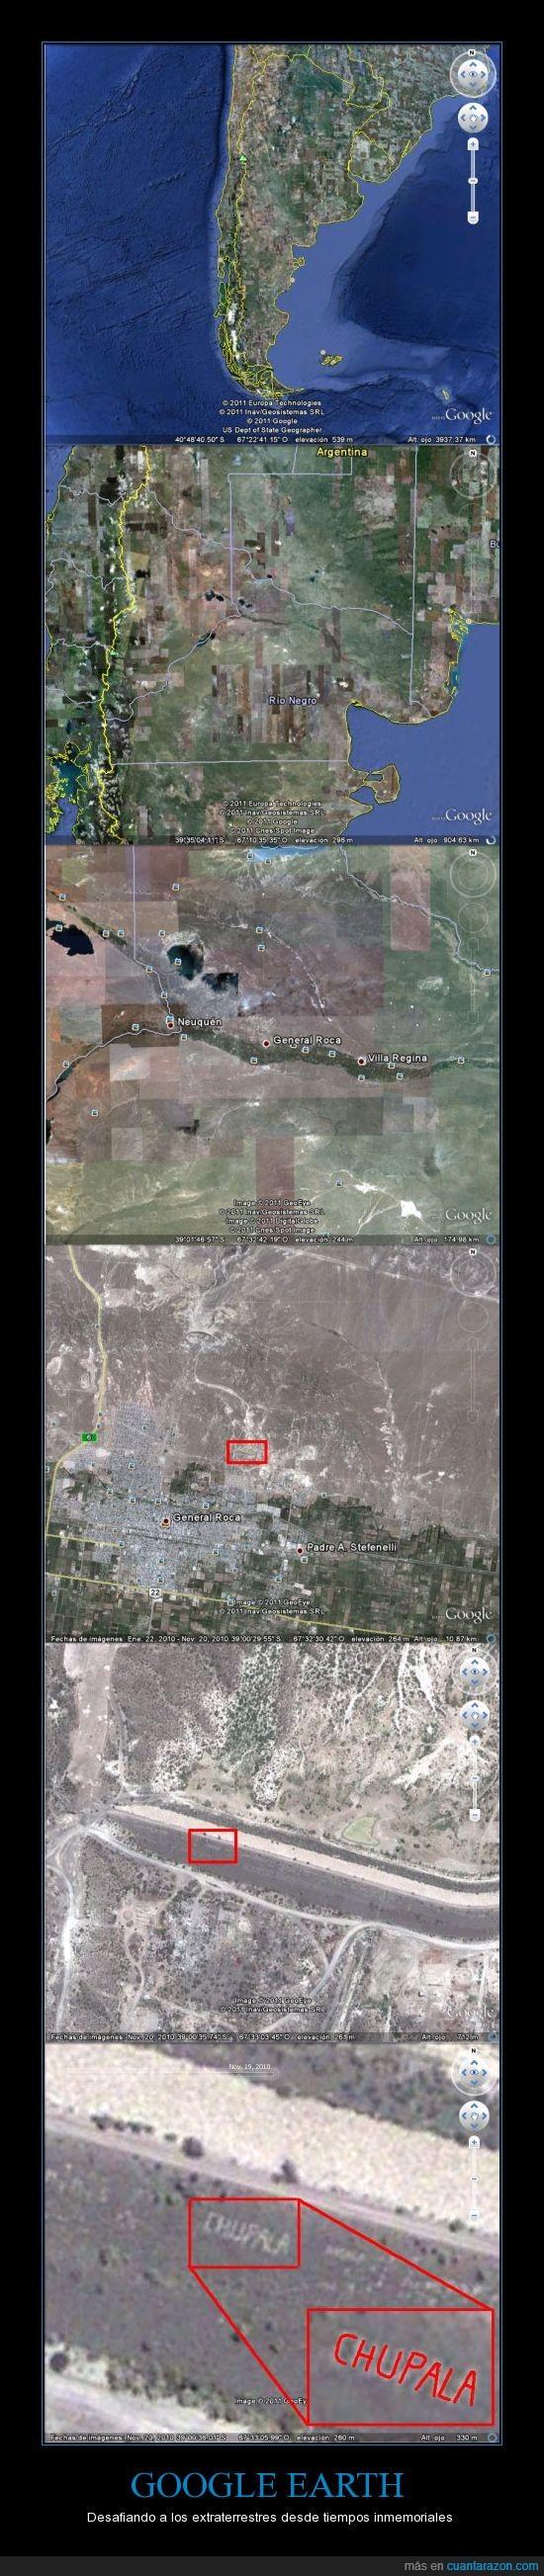 chupala,Google Earth,mensaje